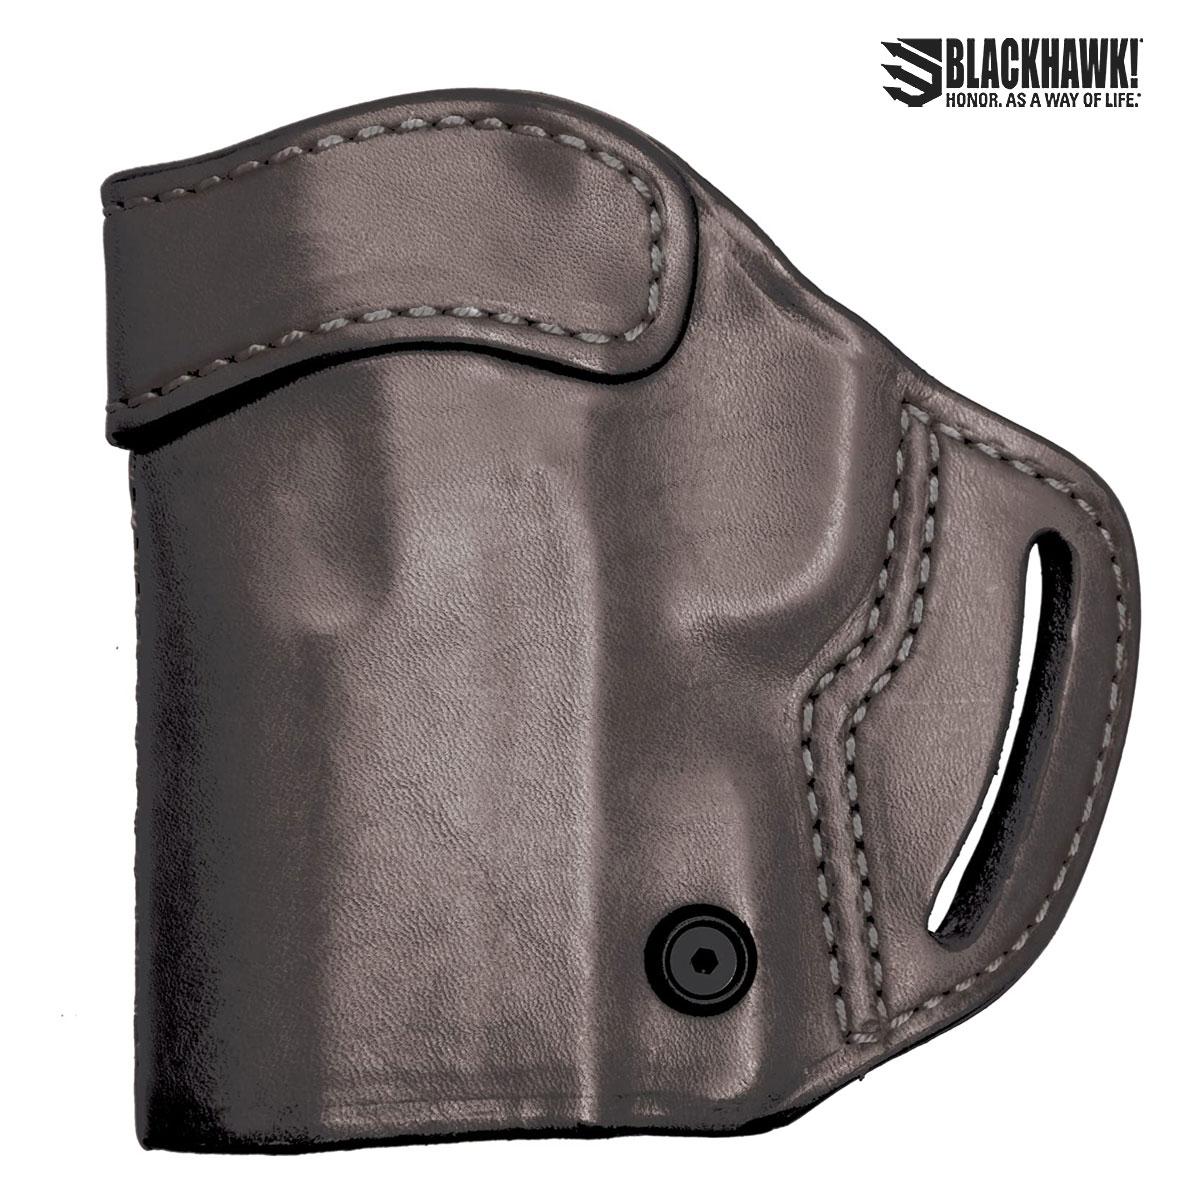 Blackhawk Leather Compact Askins Holster Glock 20/21 LH (03)- Black